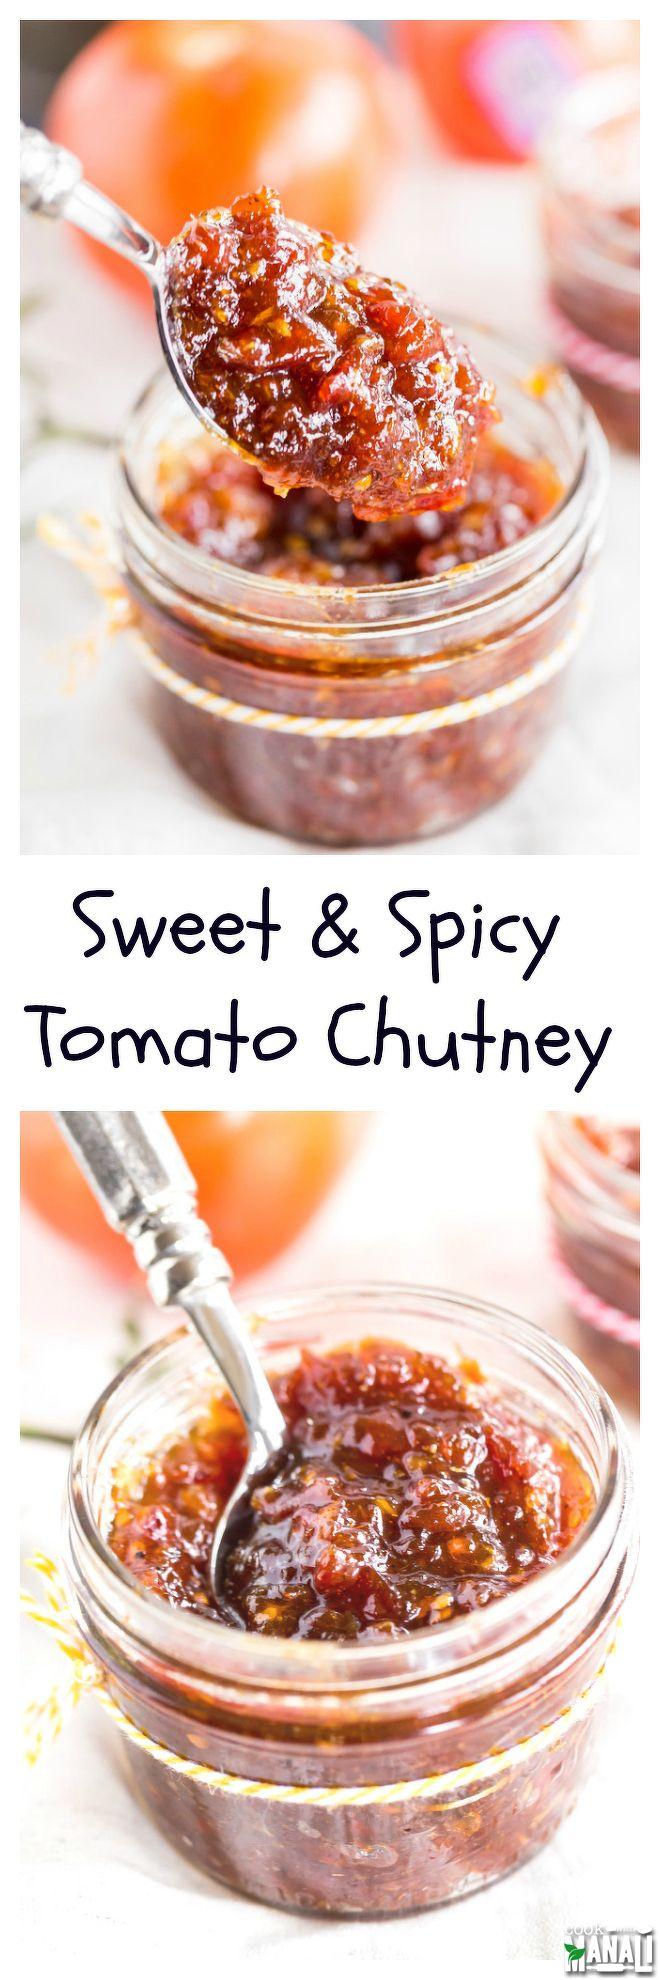 Tomato Chutney Recipe - Great British Chefs